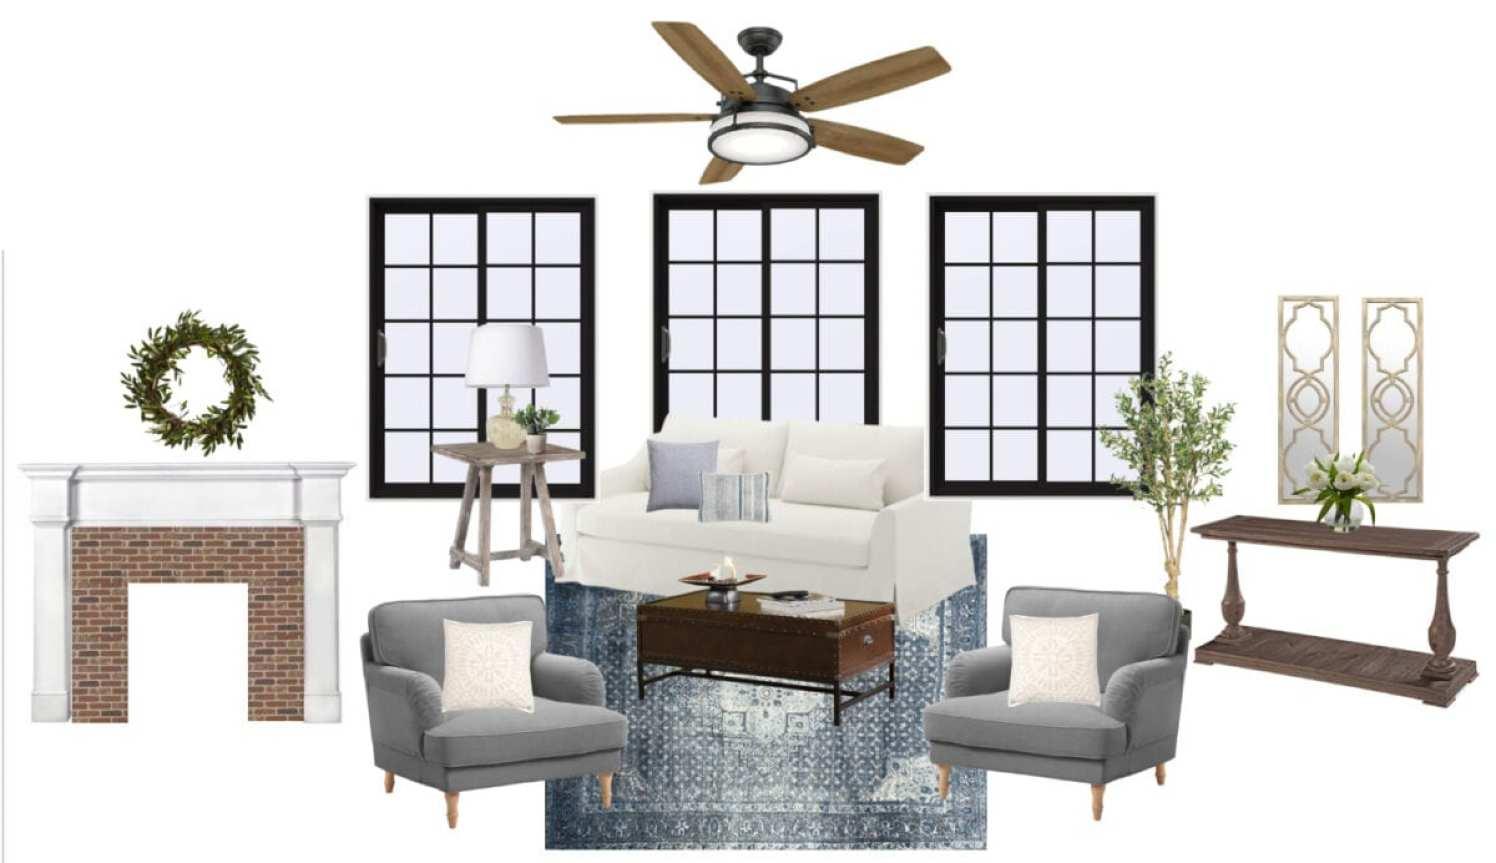 Modern Colonial Living Room Design Plan | blesserhouse.com